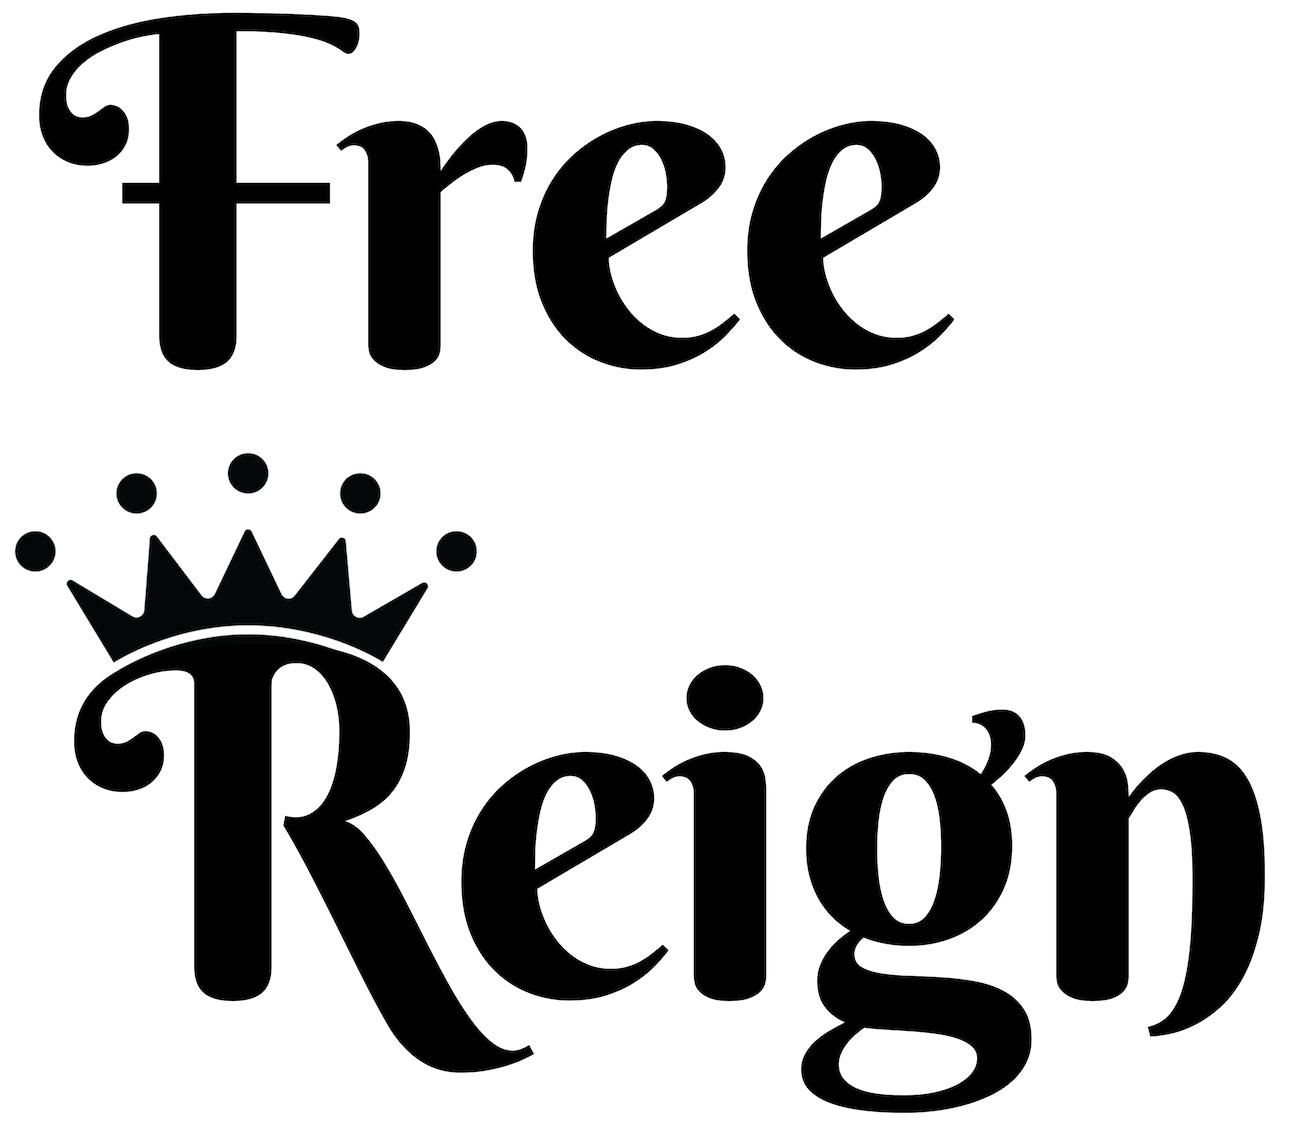 Get Free Reign